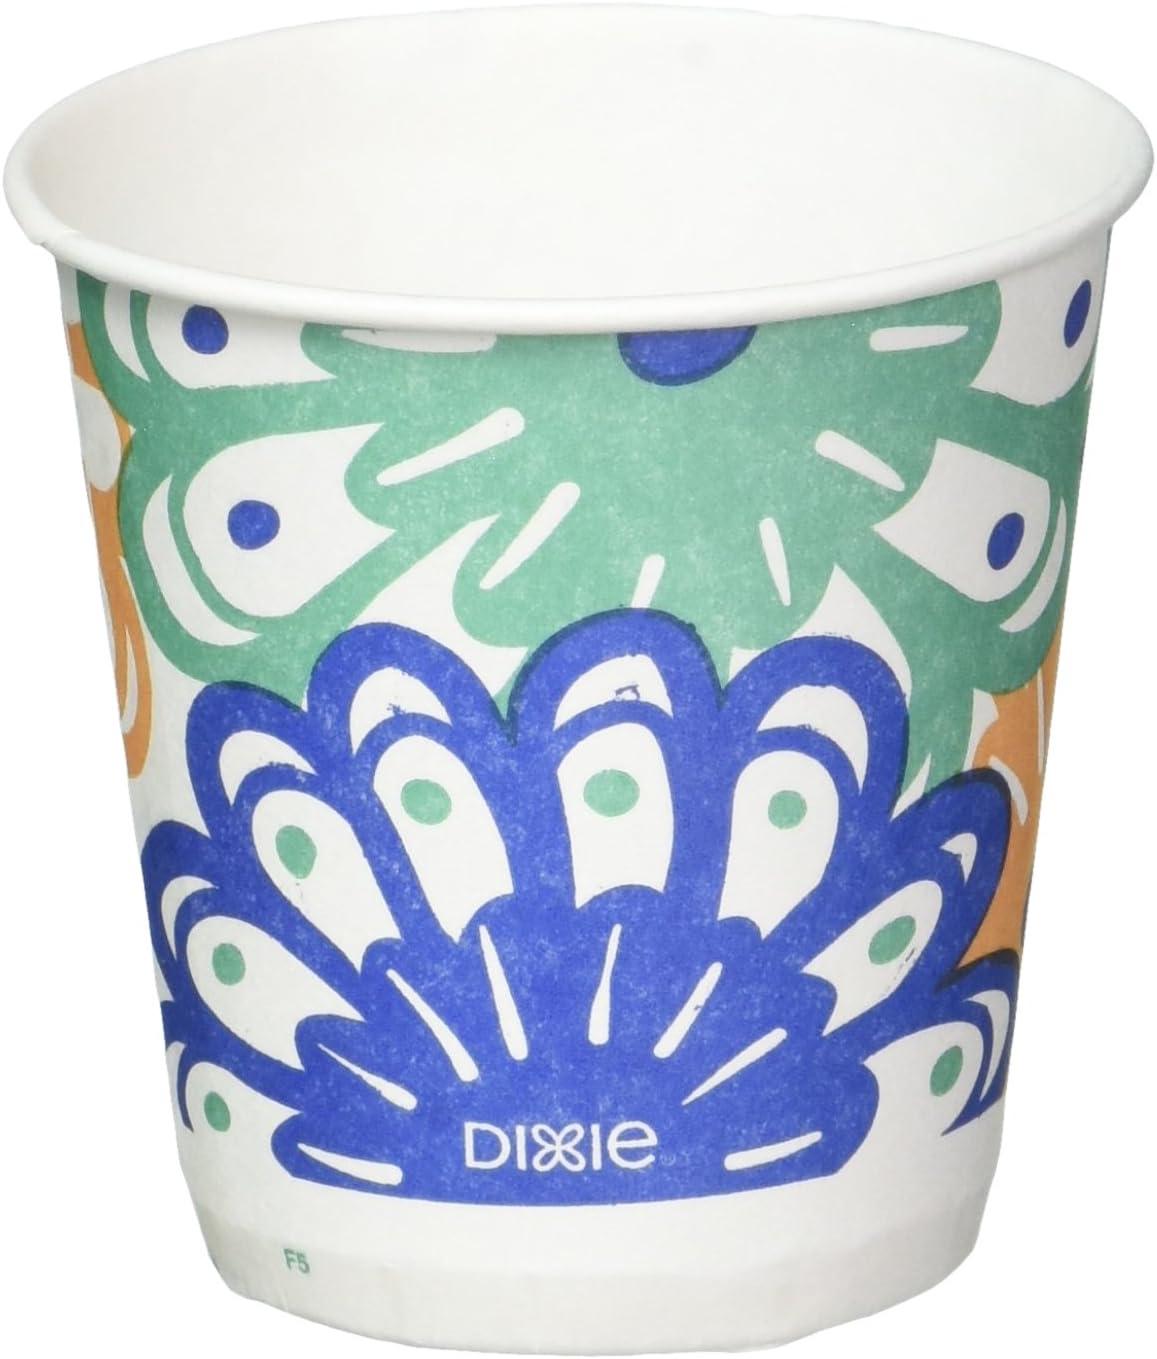 Amazon Com Dixie Disposable Bathroom Cups Coordinating Design 3 Oz 1200 Cups Health Personal Care